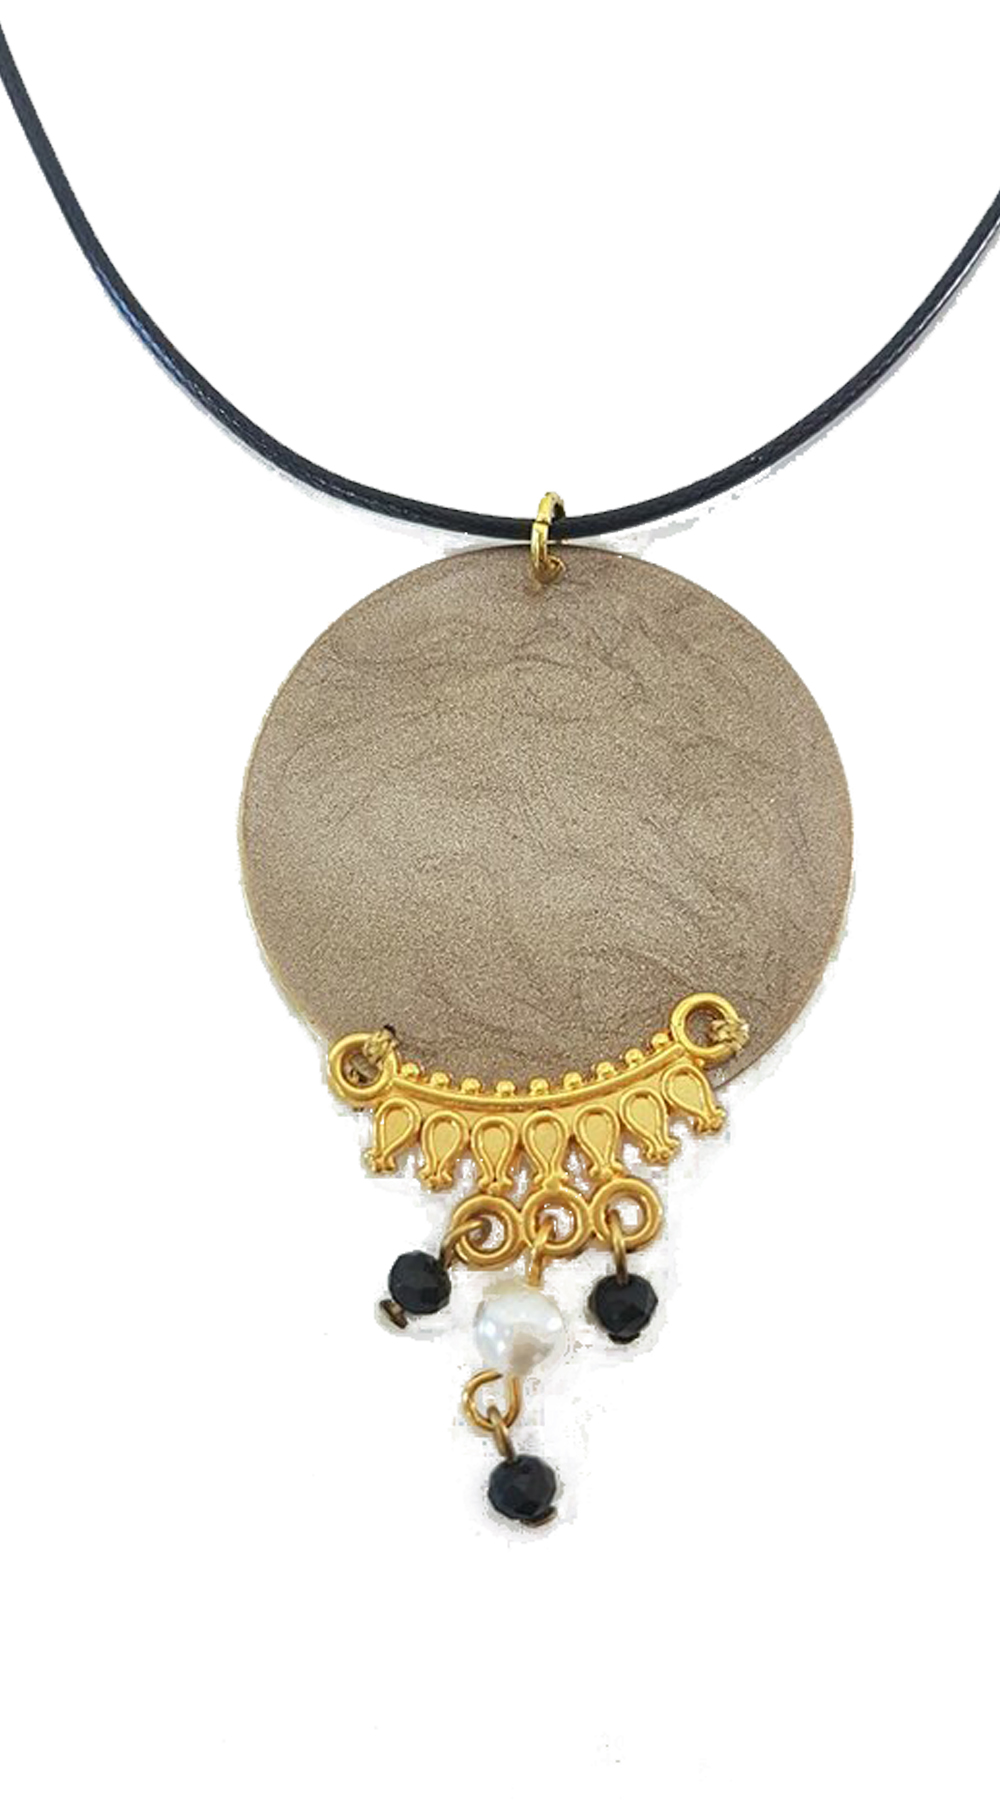 Handmade κολιέ gypsy style - MissReina - FA17AC-630c01 κοσμήματα κολιέ